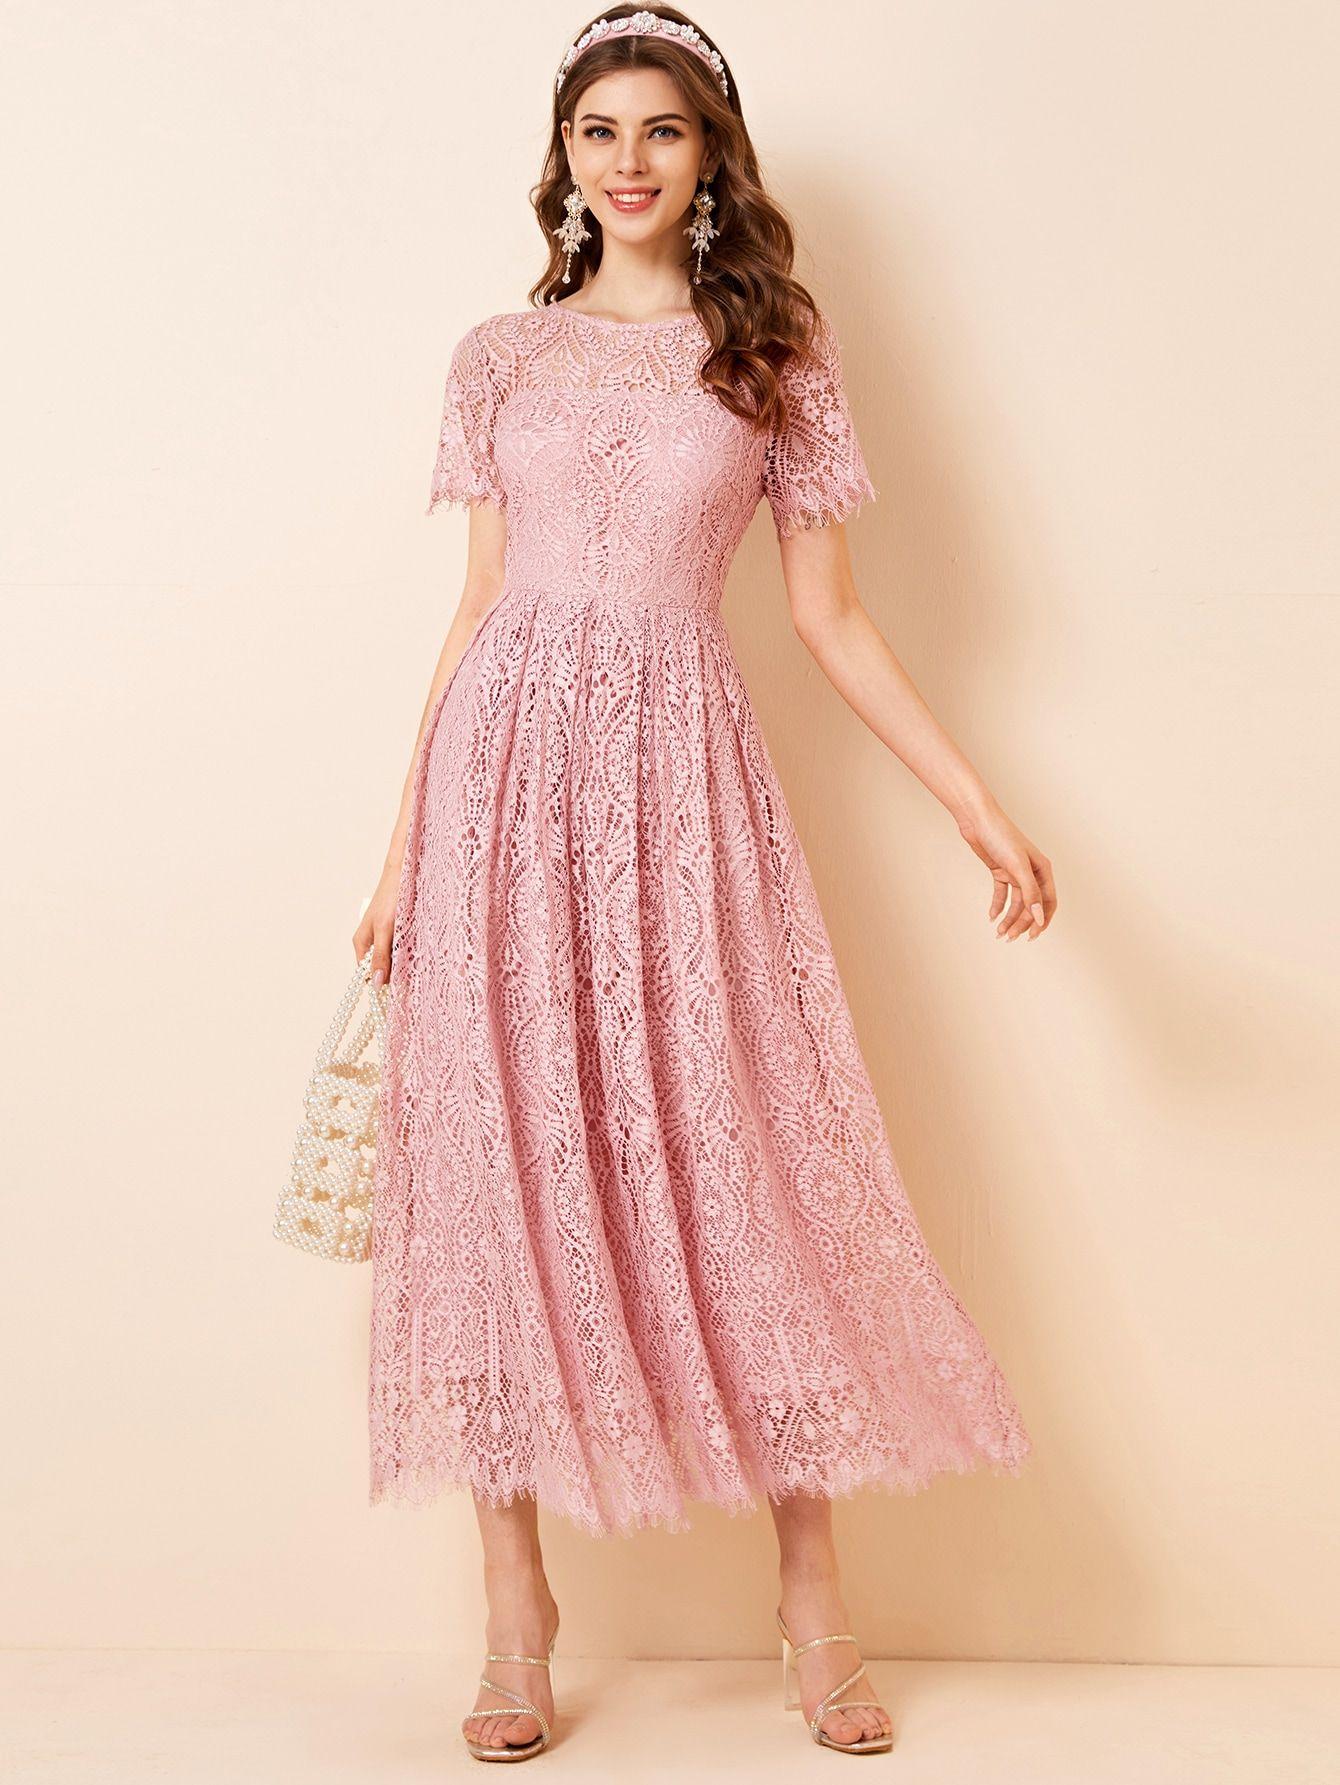 Tie Back Solid Lace Dress Shein Usa Dresses Womens Dresses Lace Dress [ 1785 x 1340 Pixel ]